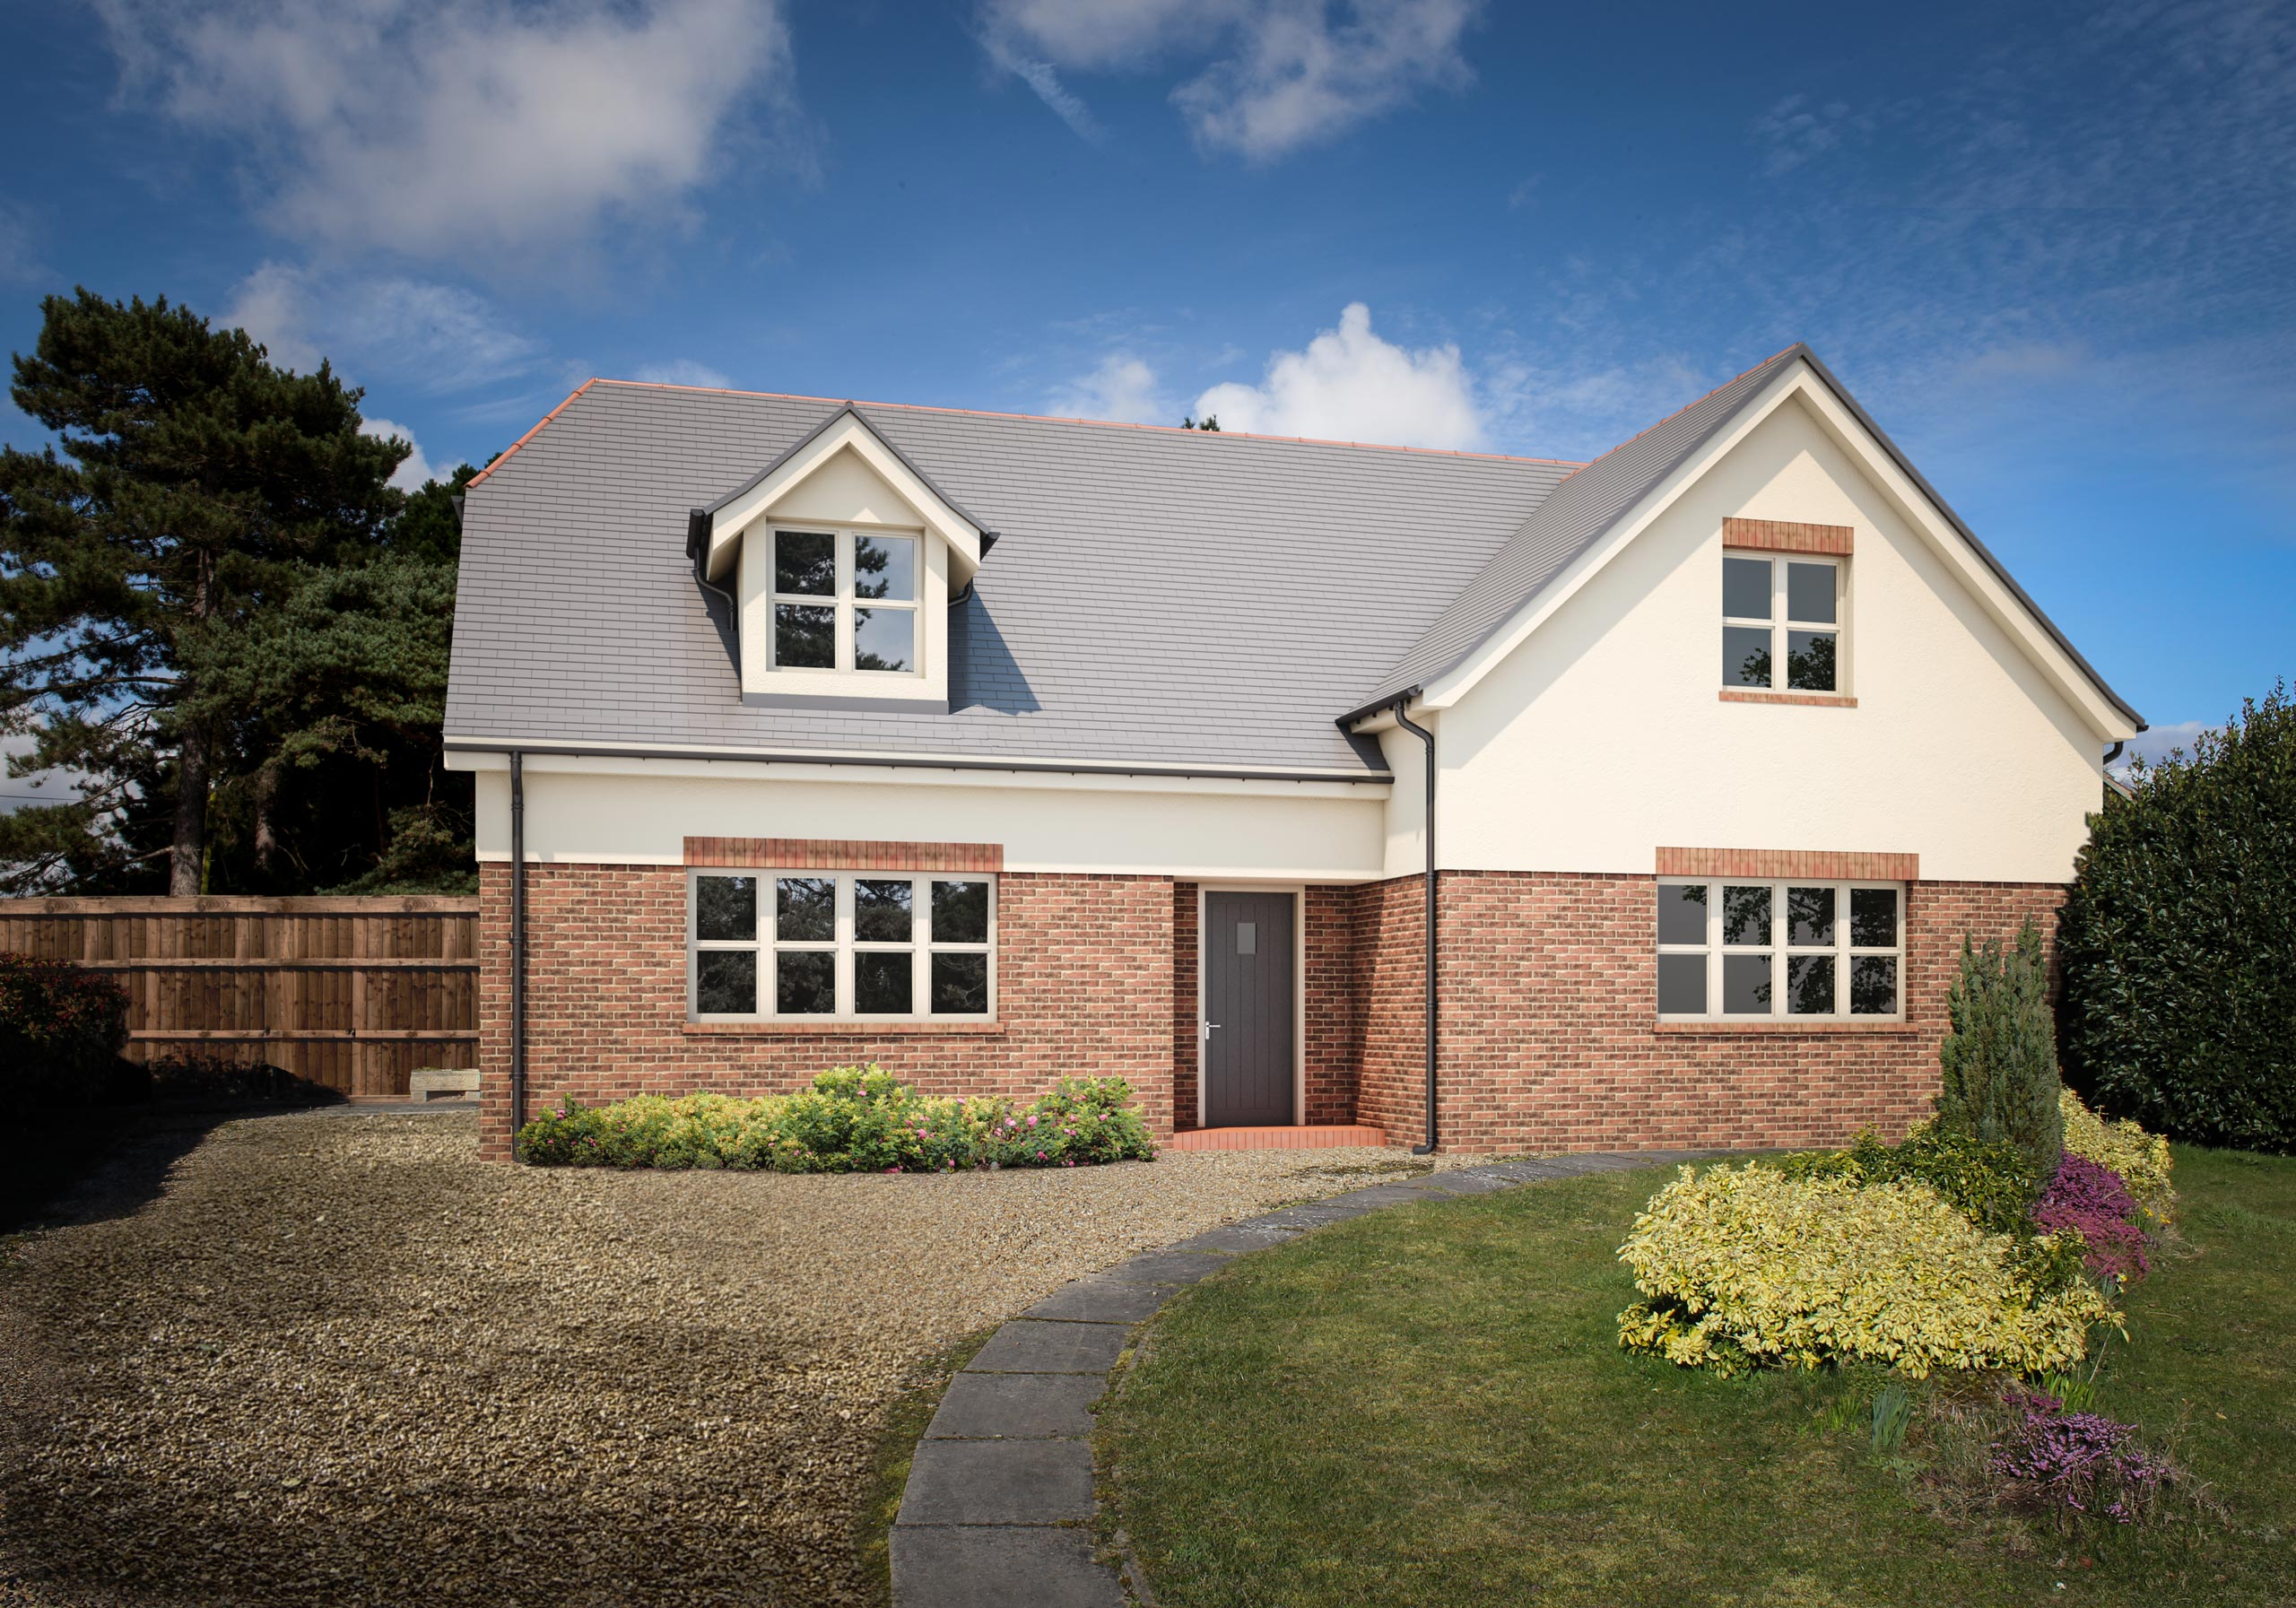 03-Architectural-visualisation-Dorset-London-Elmswood-Benchmark